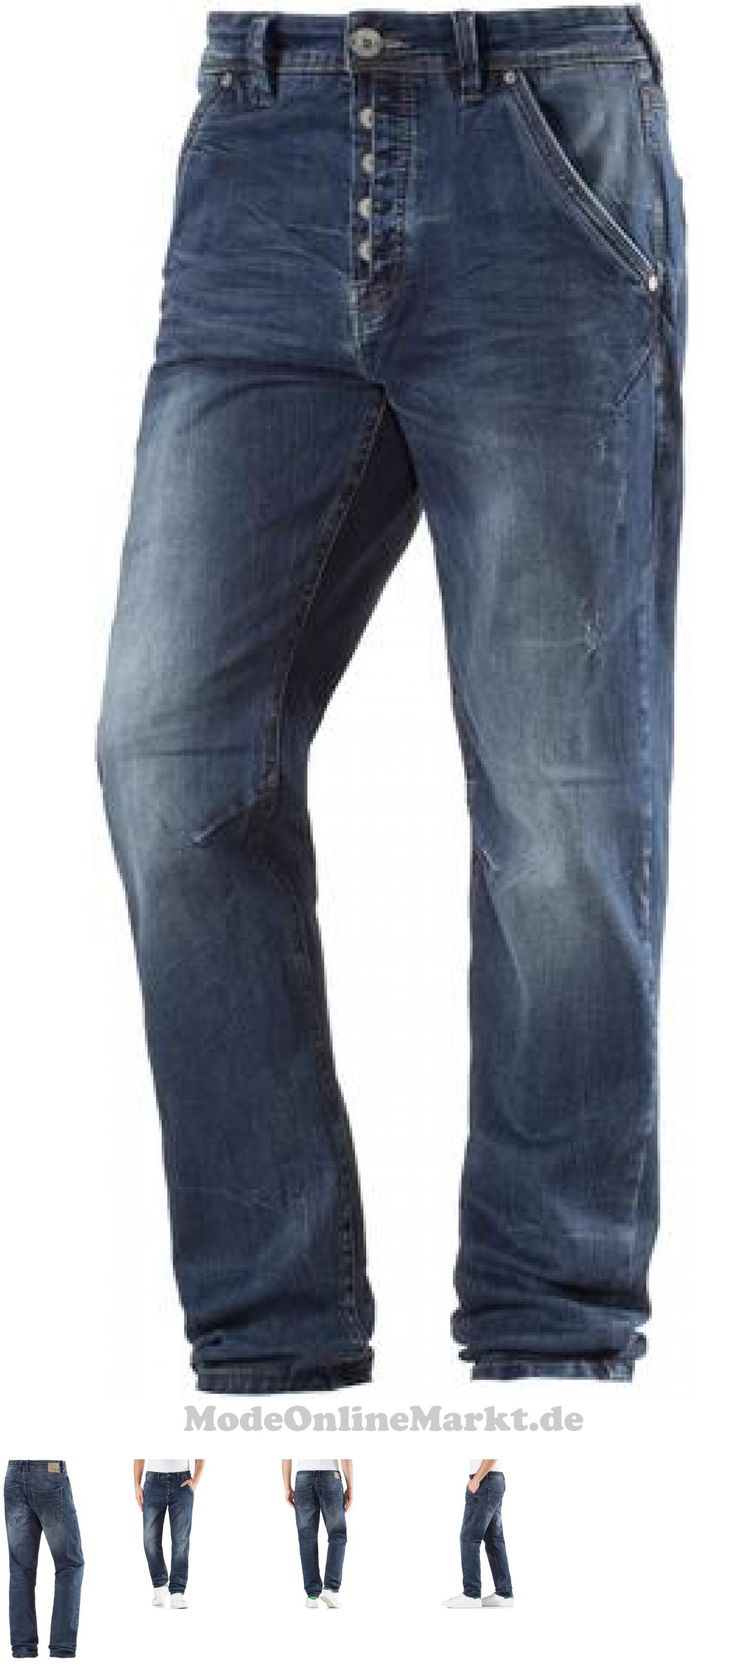 04059145069898 | #TIMEZONE #Herren #Dwayne #Anti #Fit #Jeans #blue #denim